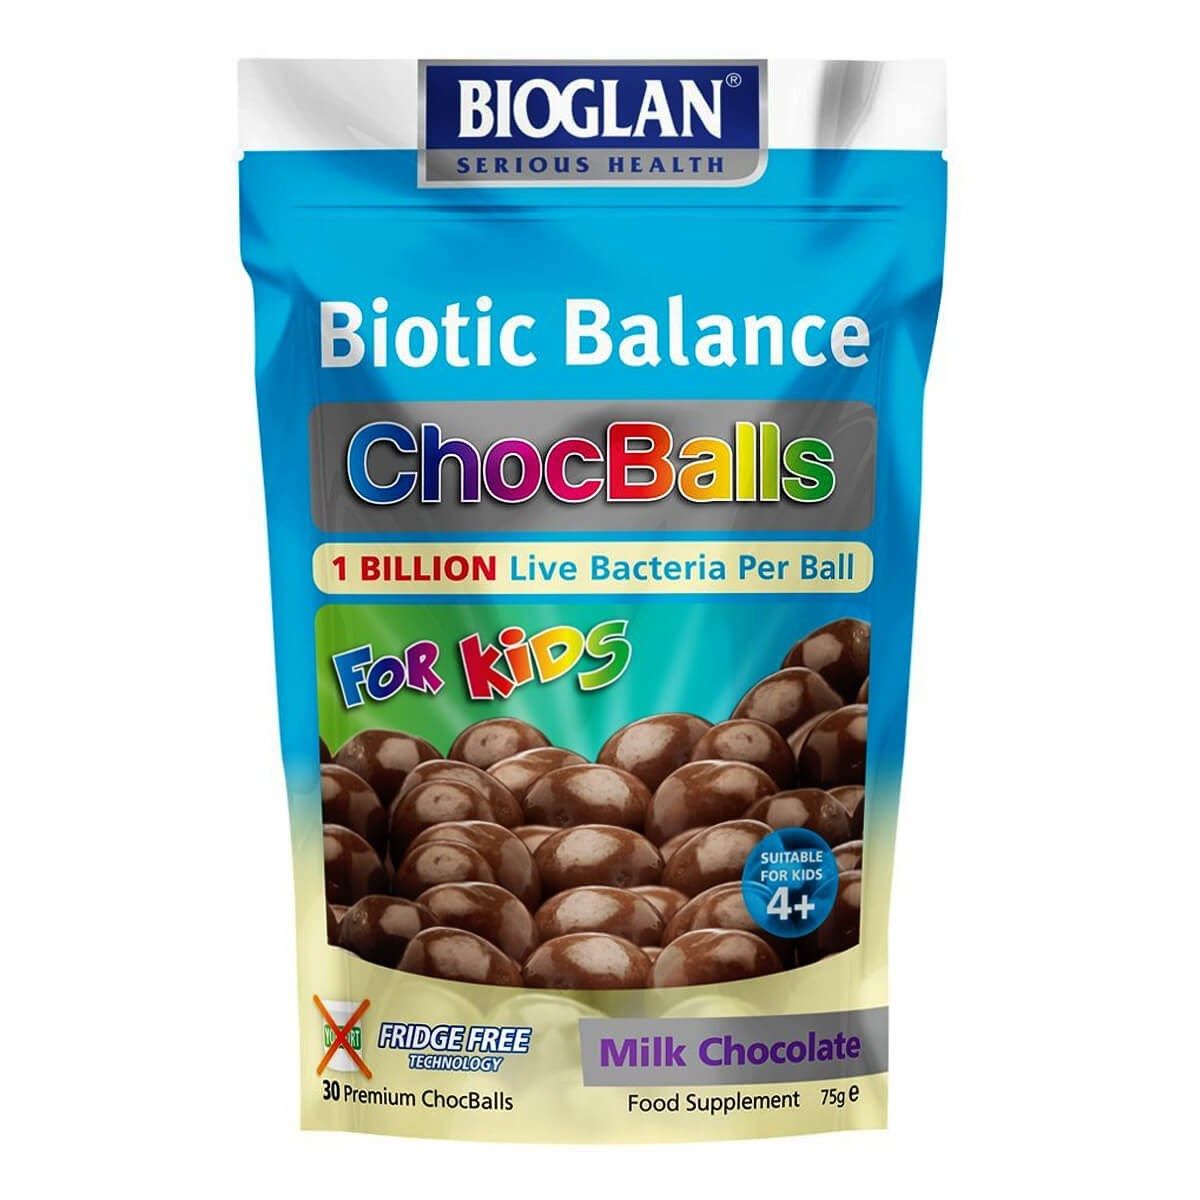 Bioglan Biotic Balance Kids Milk ChocBalls